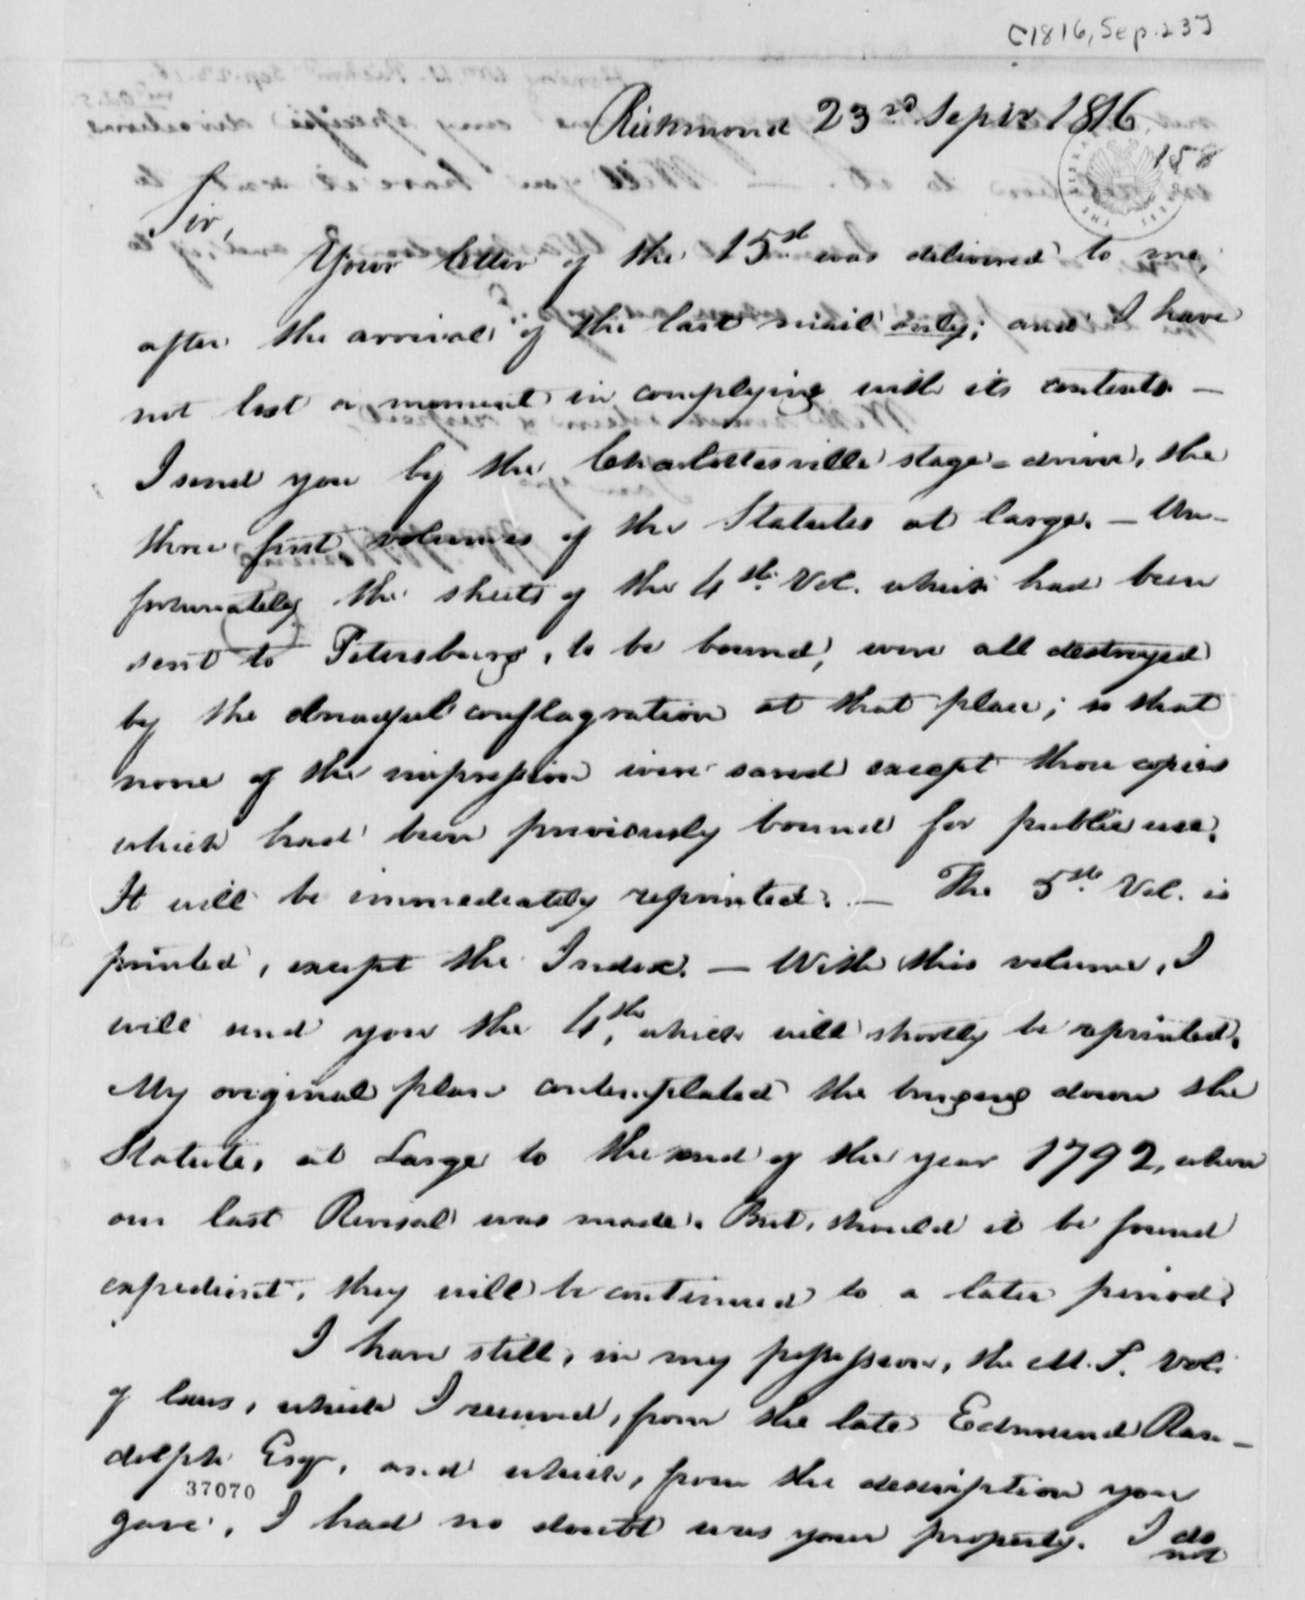 William Waller Hening to Thomas Jefferson, September 23, 1816